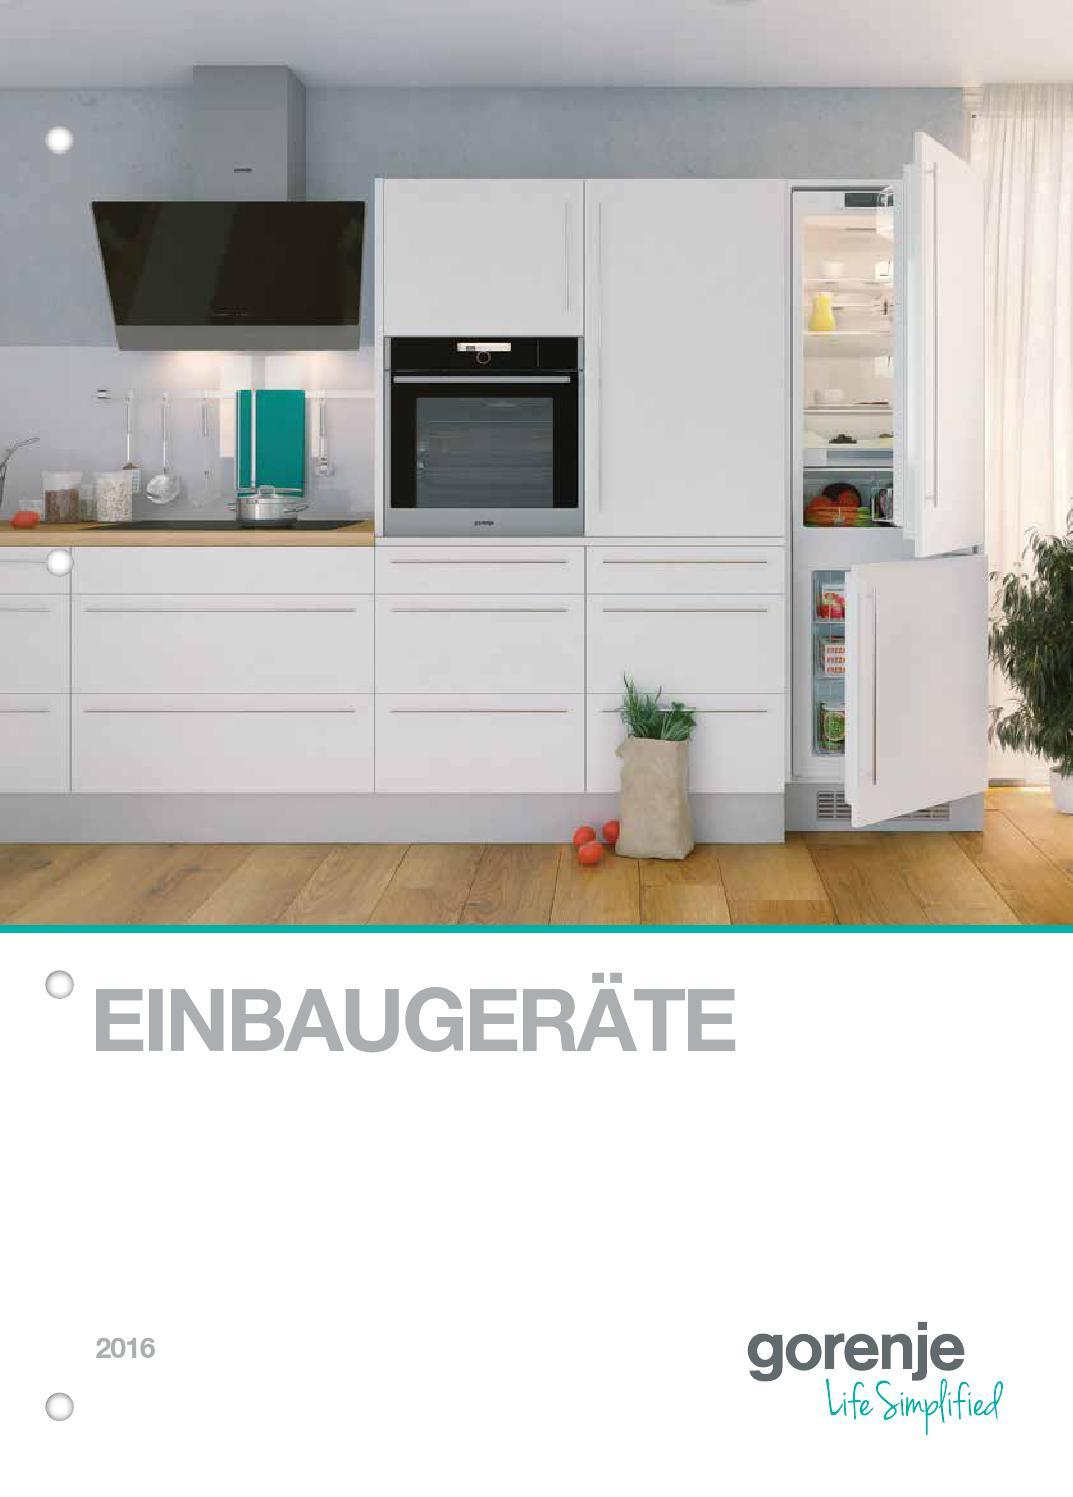 Katalog einbaugeräte 2016 by Gorenje d d issuu